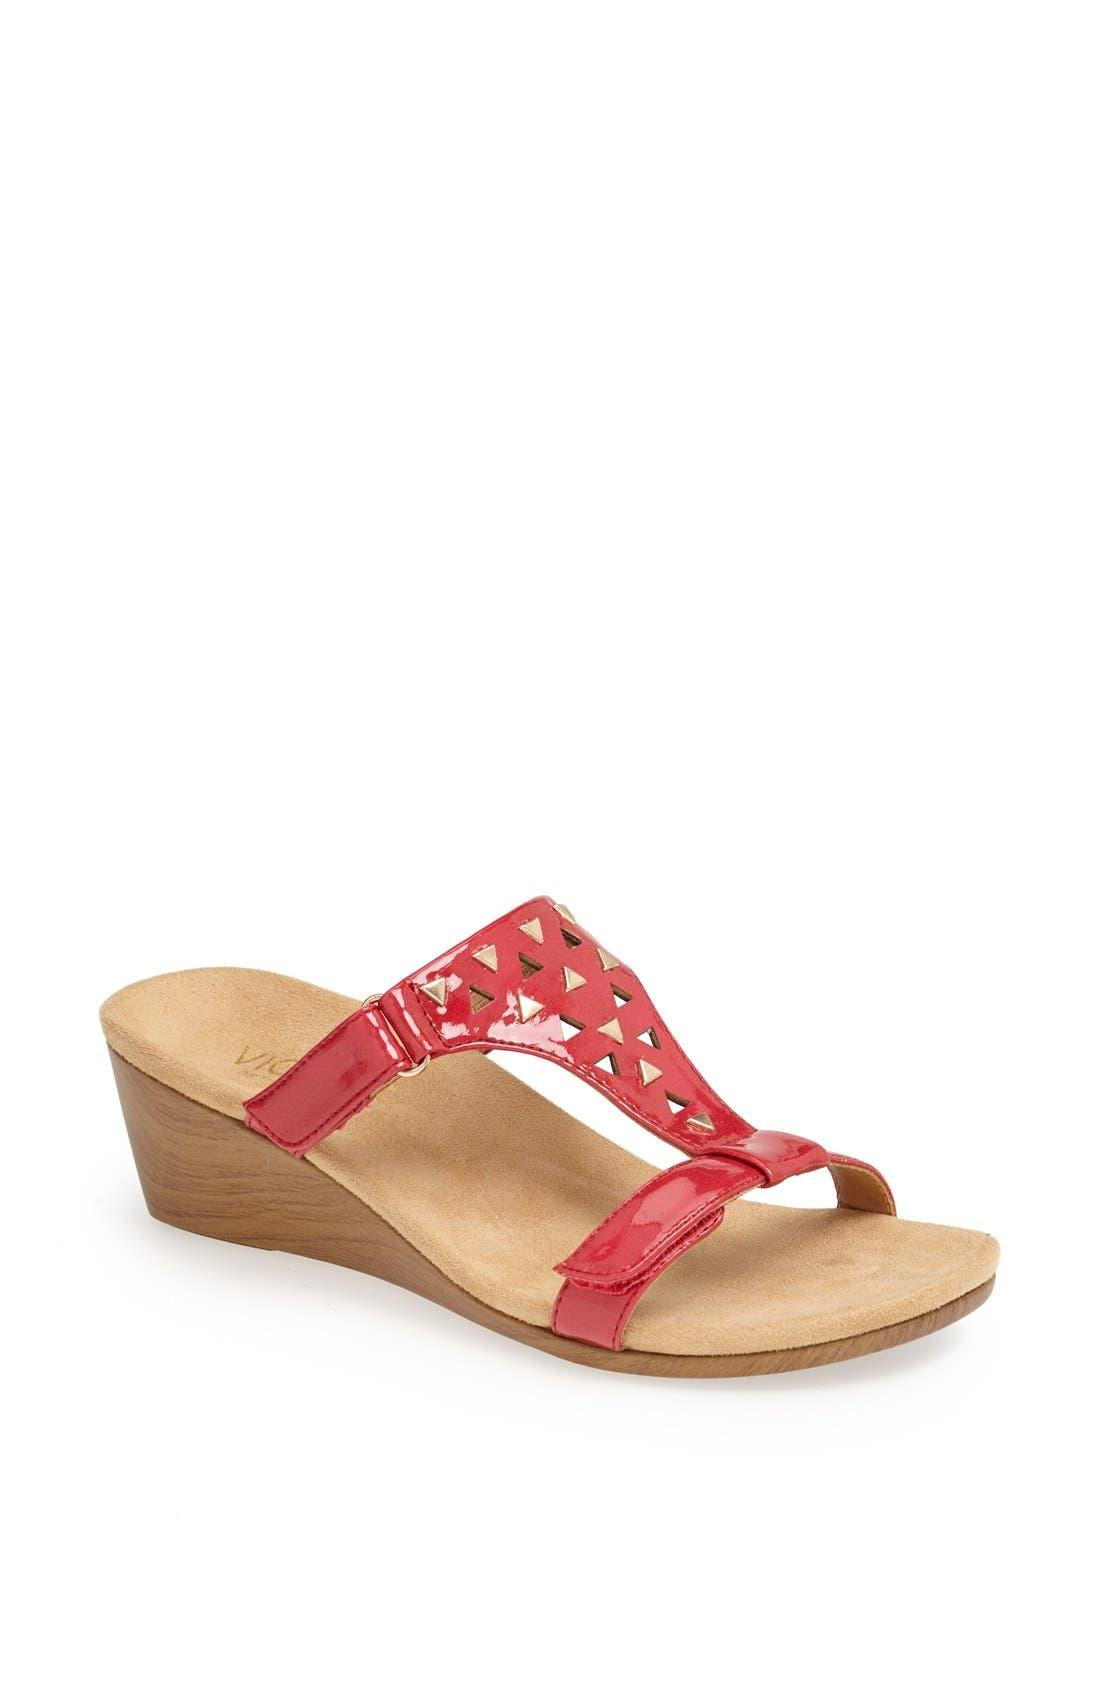 Main Image - Vionic 'Maggie' Geometric Cutout Wedge Sandal